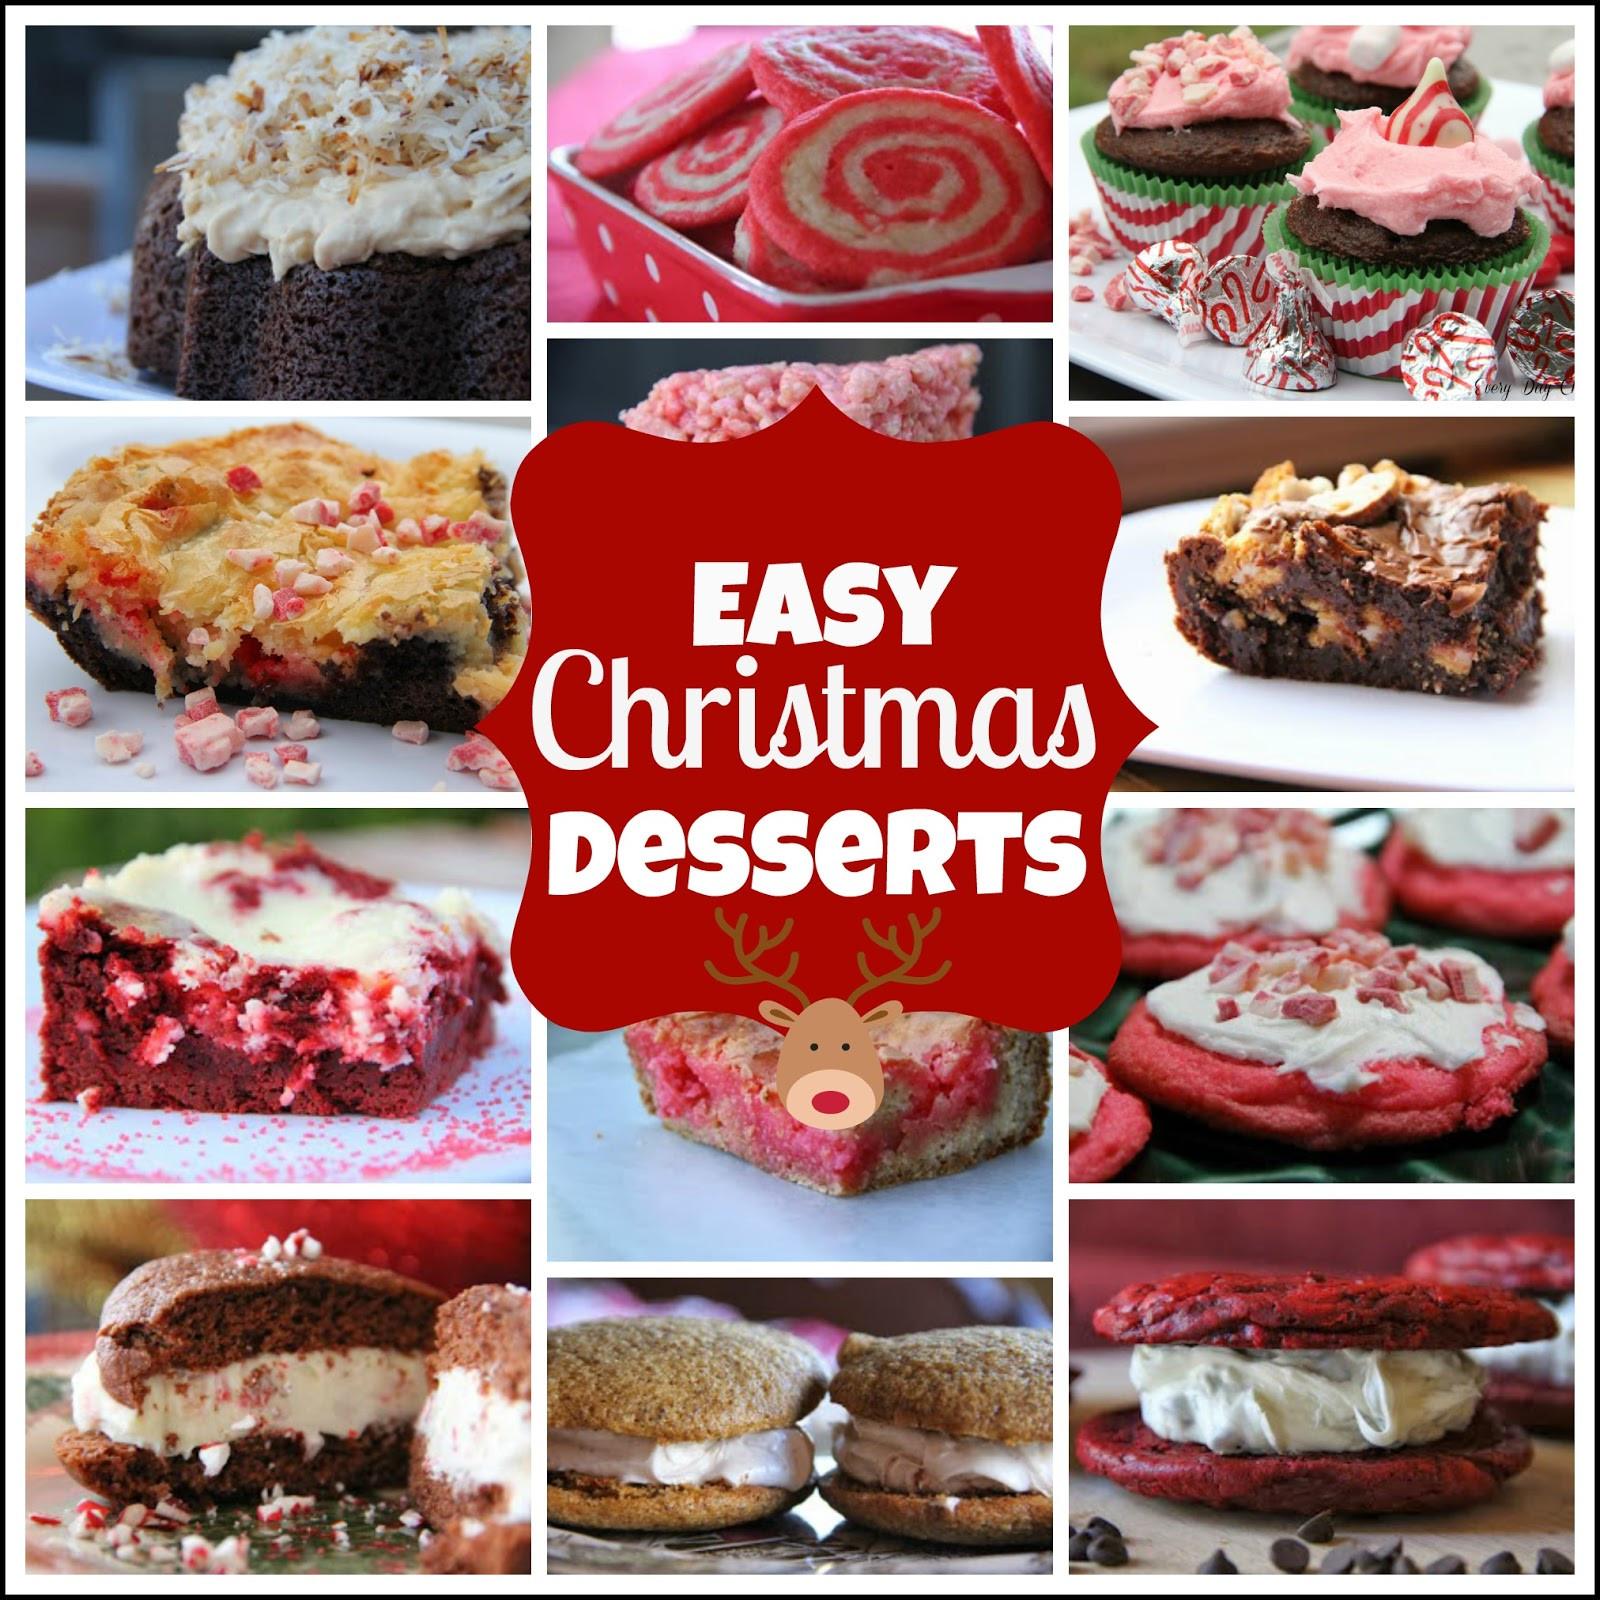 Easy Desserts For Christmas  Easy Christmas Desserts